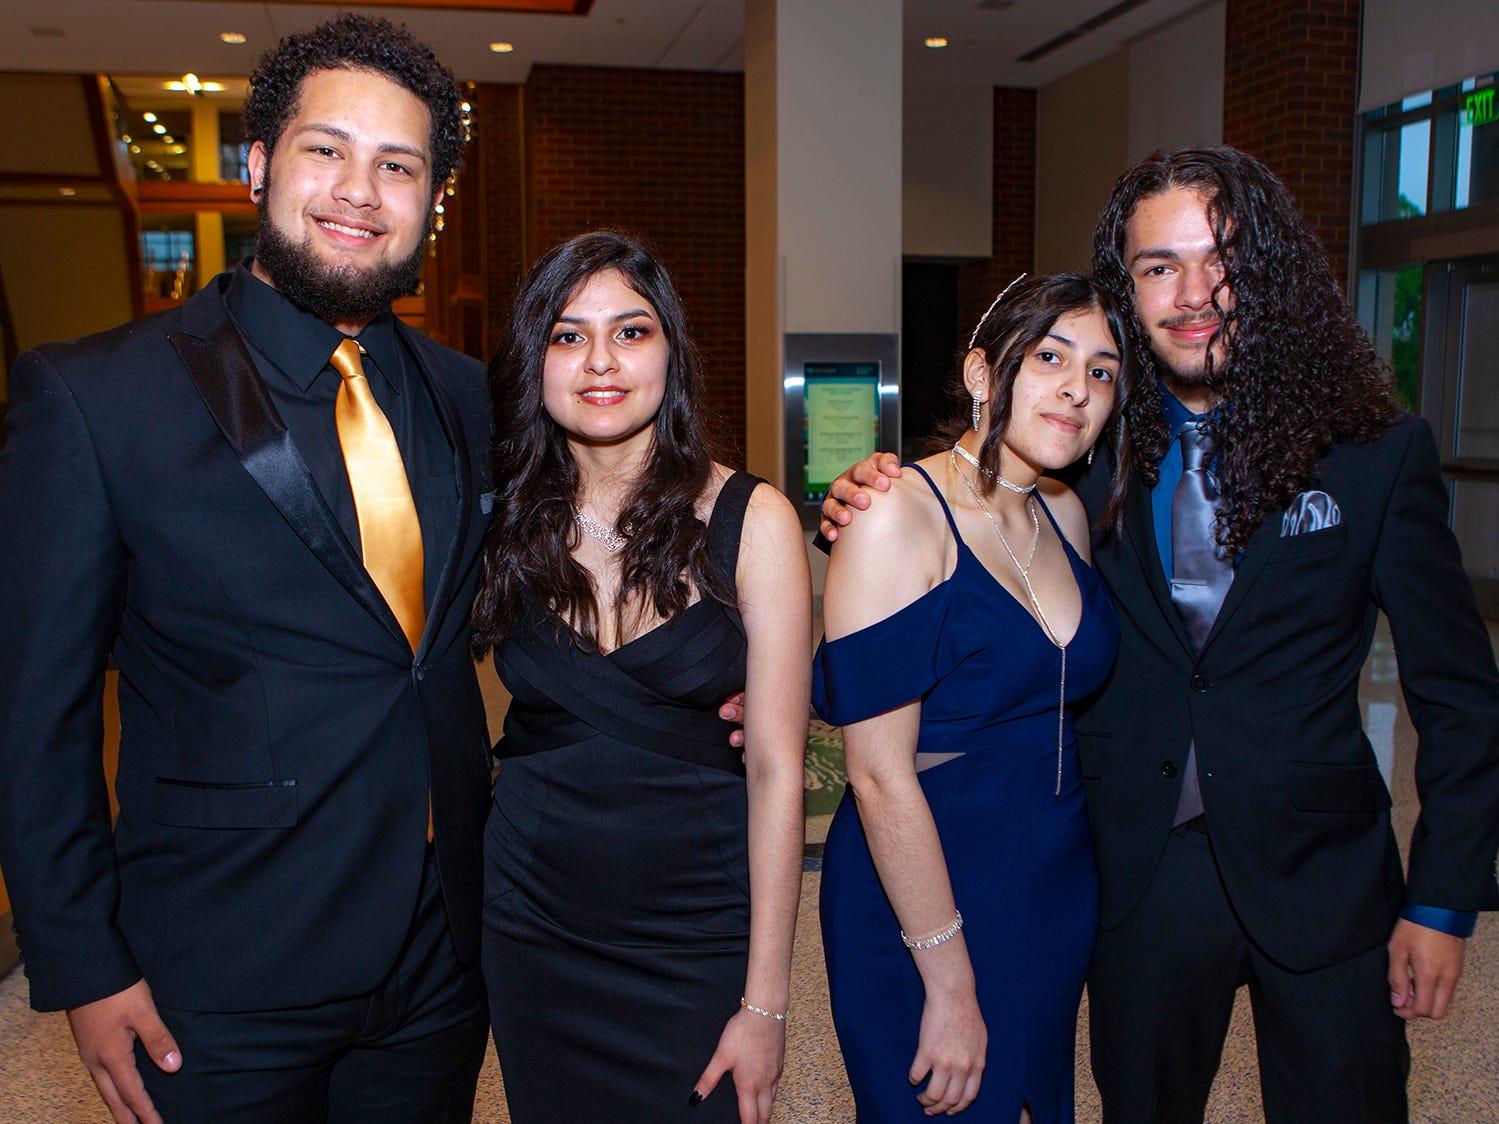 Hecktor Feliciano, Iris Gonzalez, Karen Gonzalez and Andres Feliciano at La Vergne High's prom, held Saturday, May 4, 2019 at MTSU's Student Union Building.